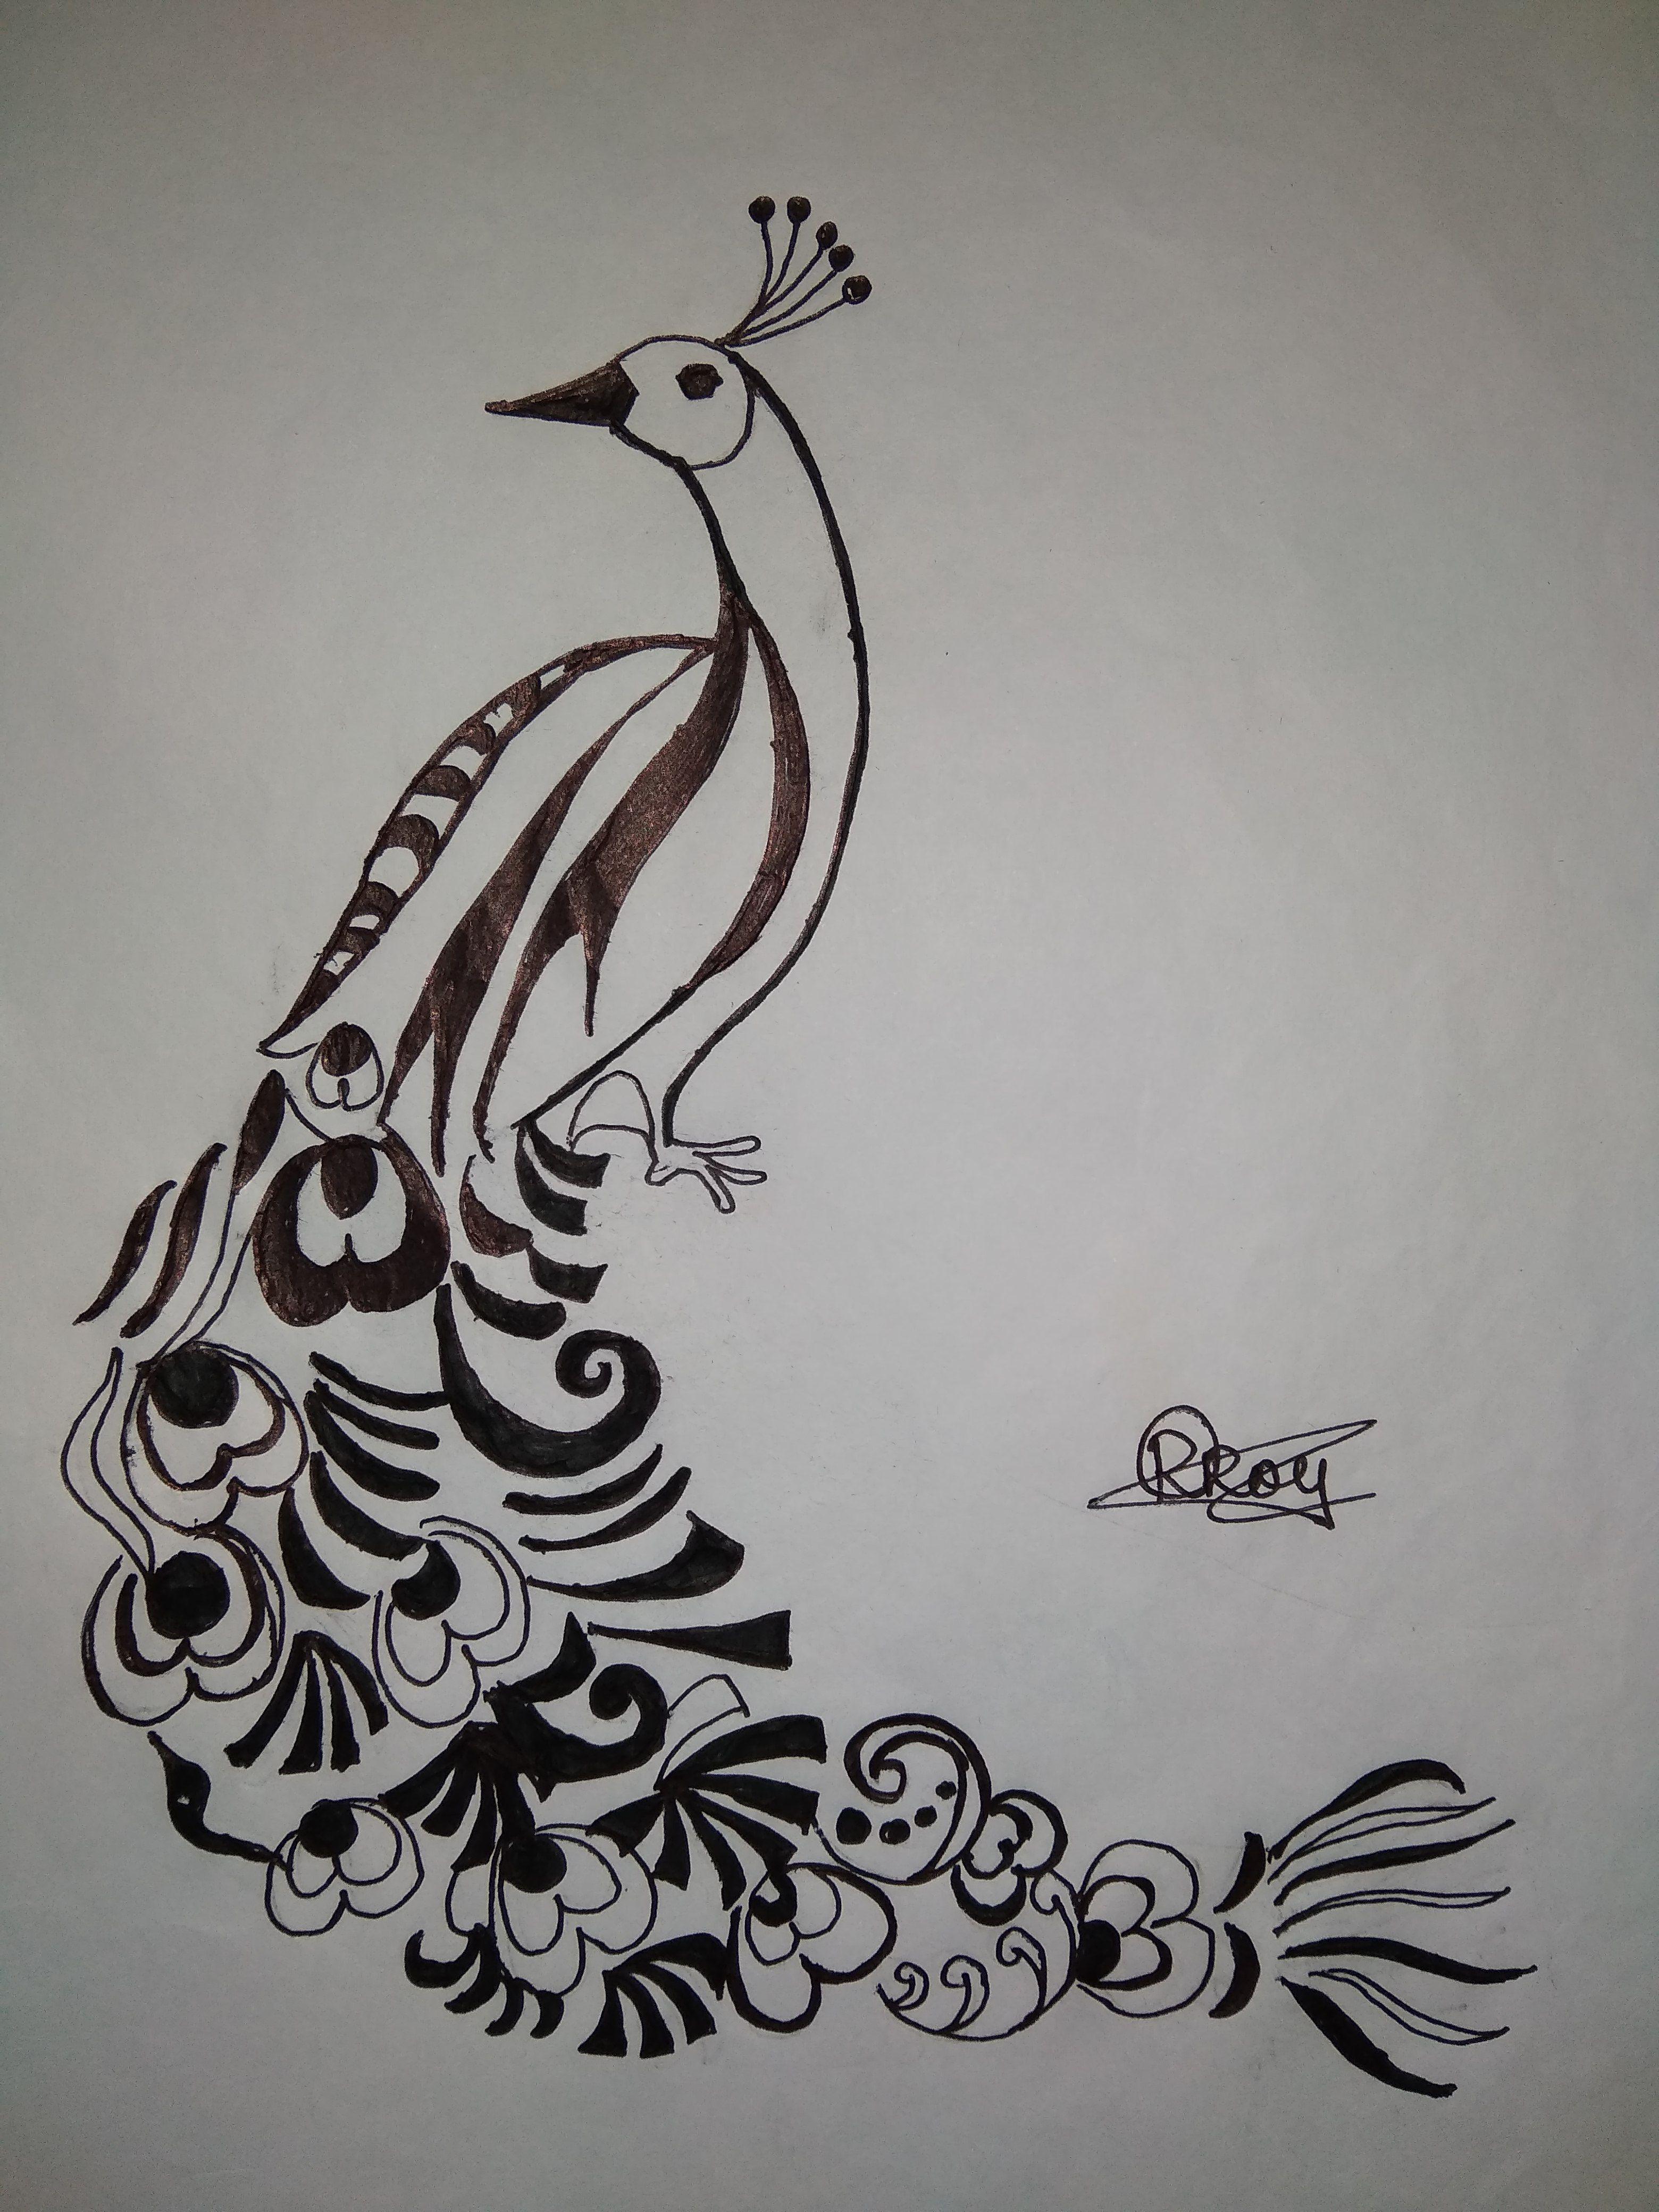 Art Sketch Peacock Pencil Sketch Drawing Art Sketches Pencil Sketch Drawing Peacock Drawing